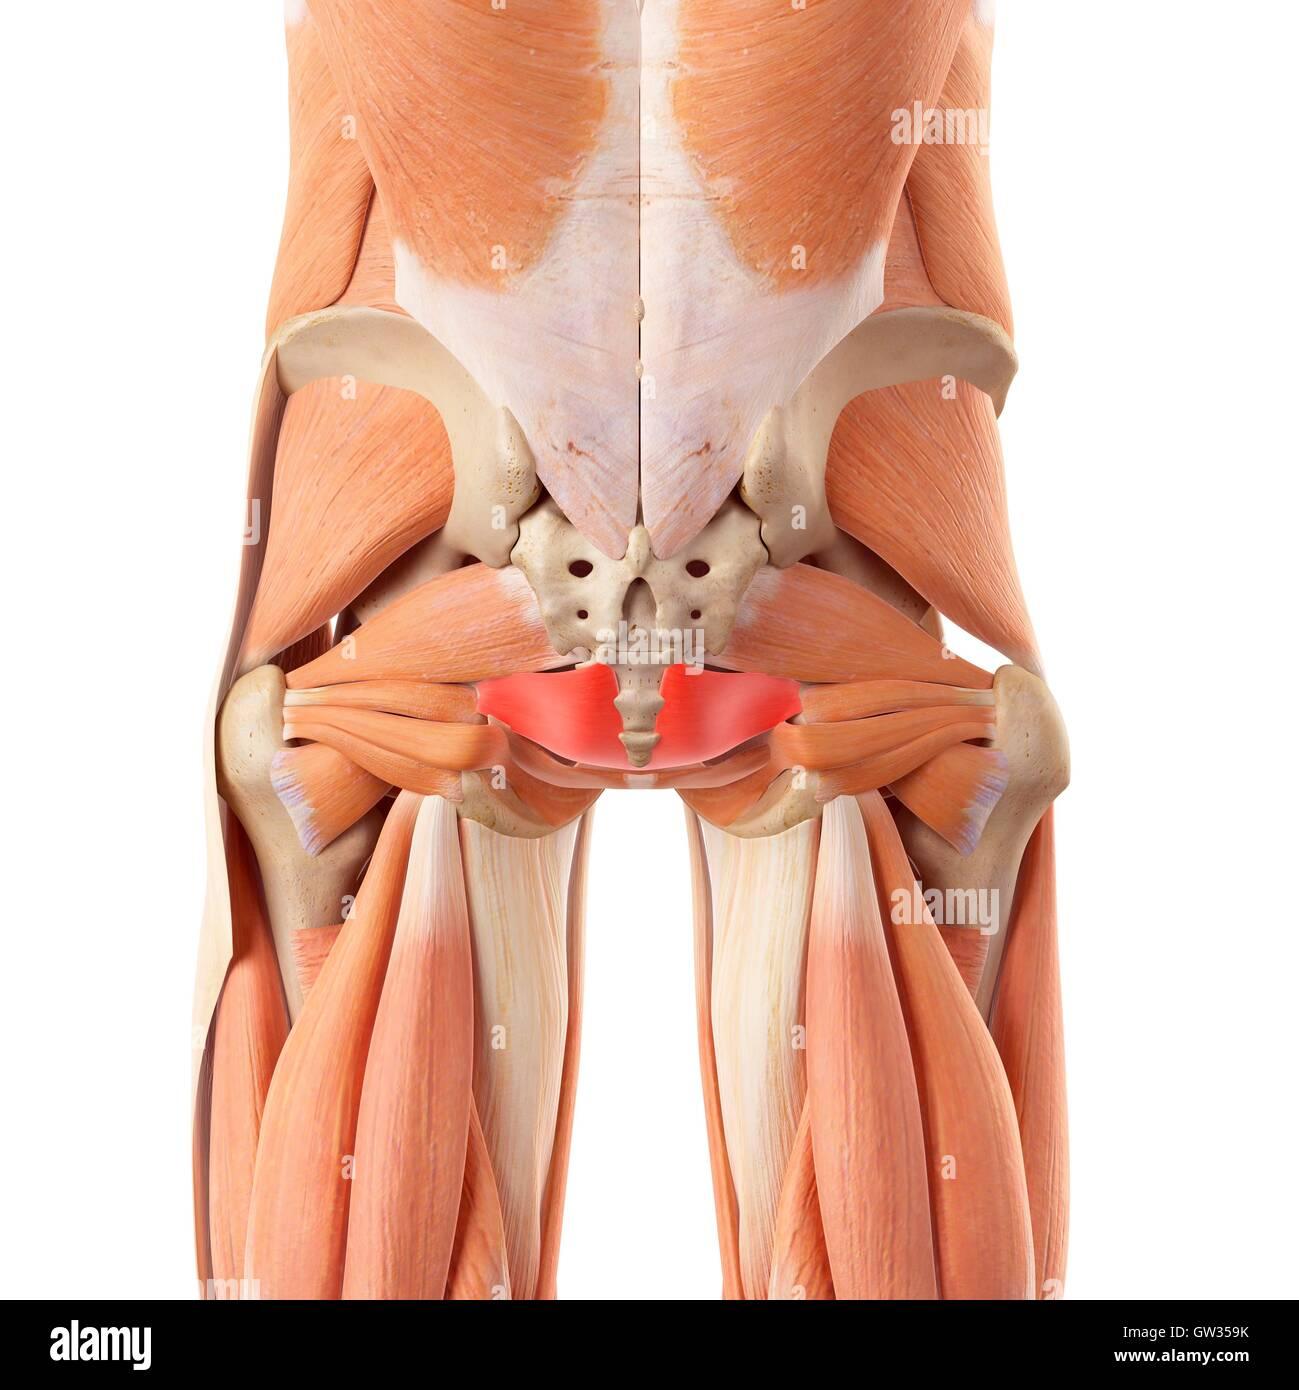 Human buttock muscles, illustration Stock Photo: 118698655 - Alamy